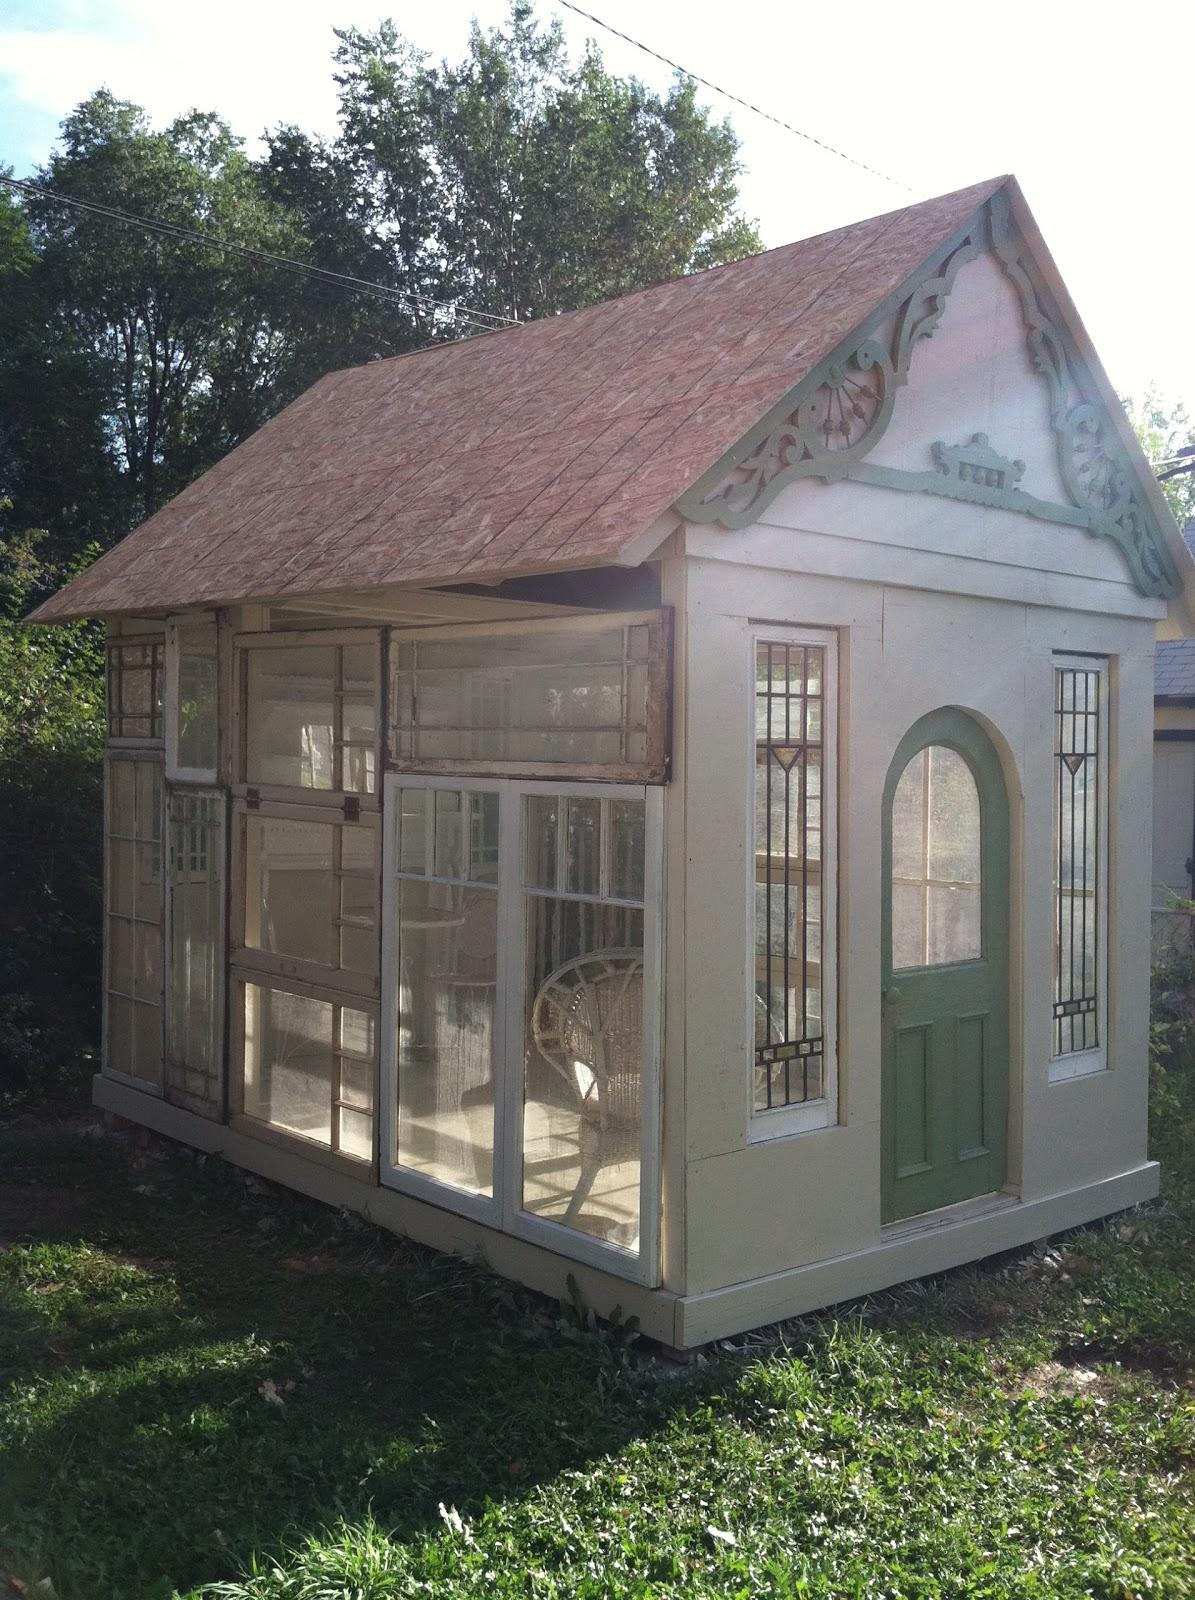 Old garden house - My Garden House Gets Window Walls